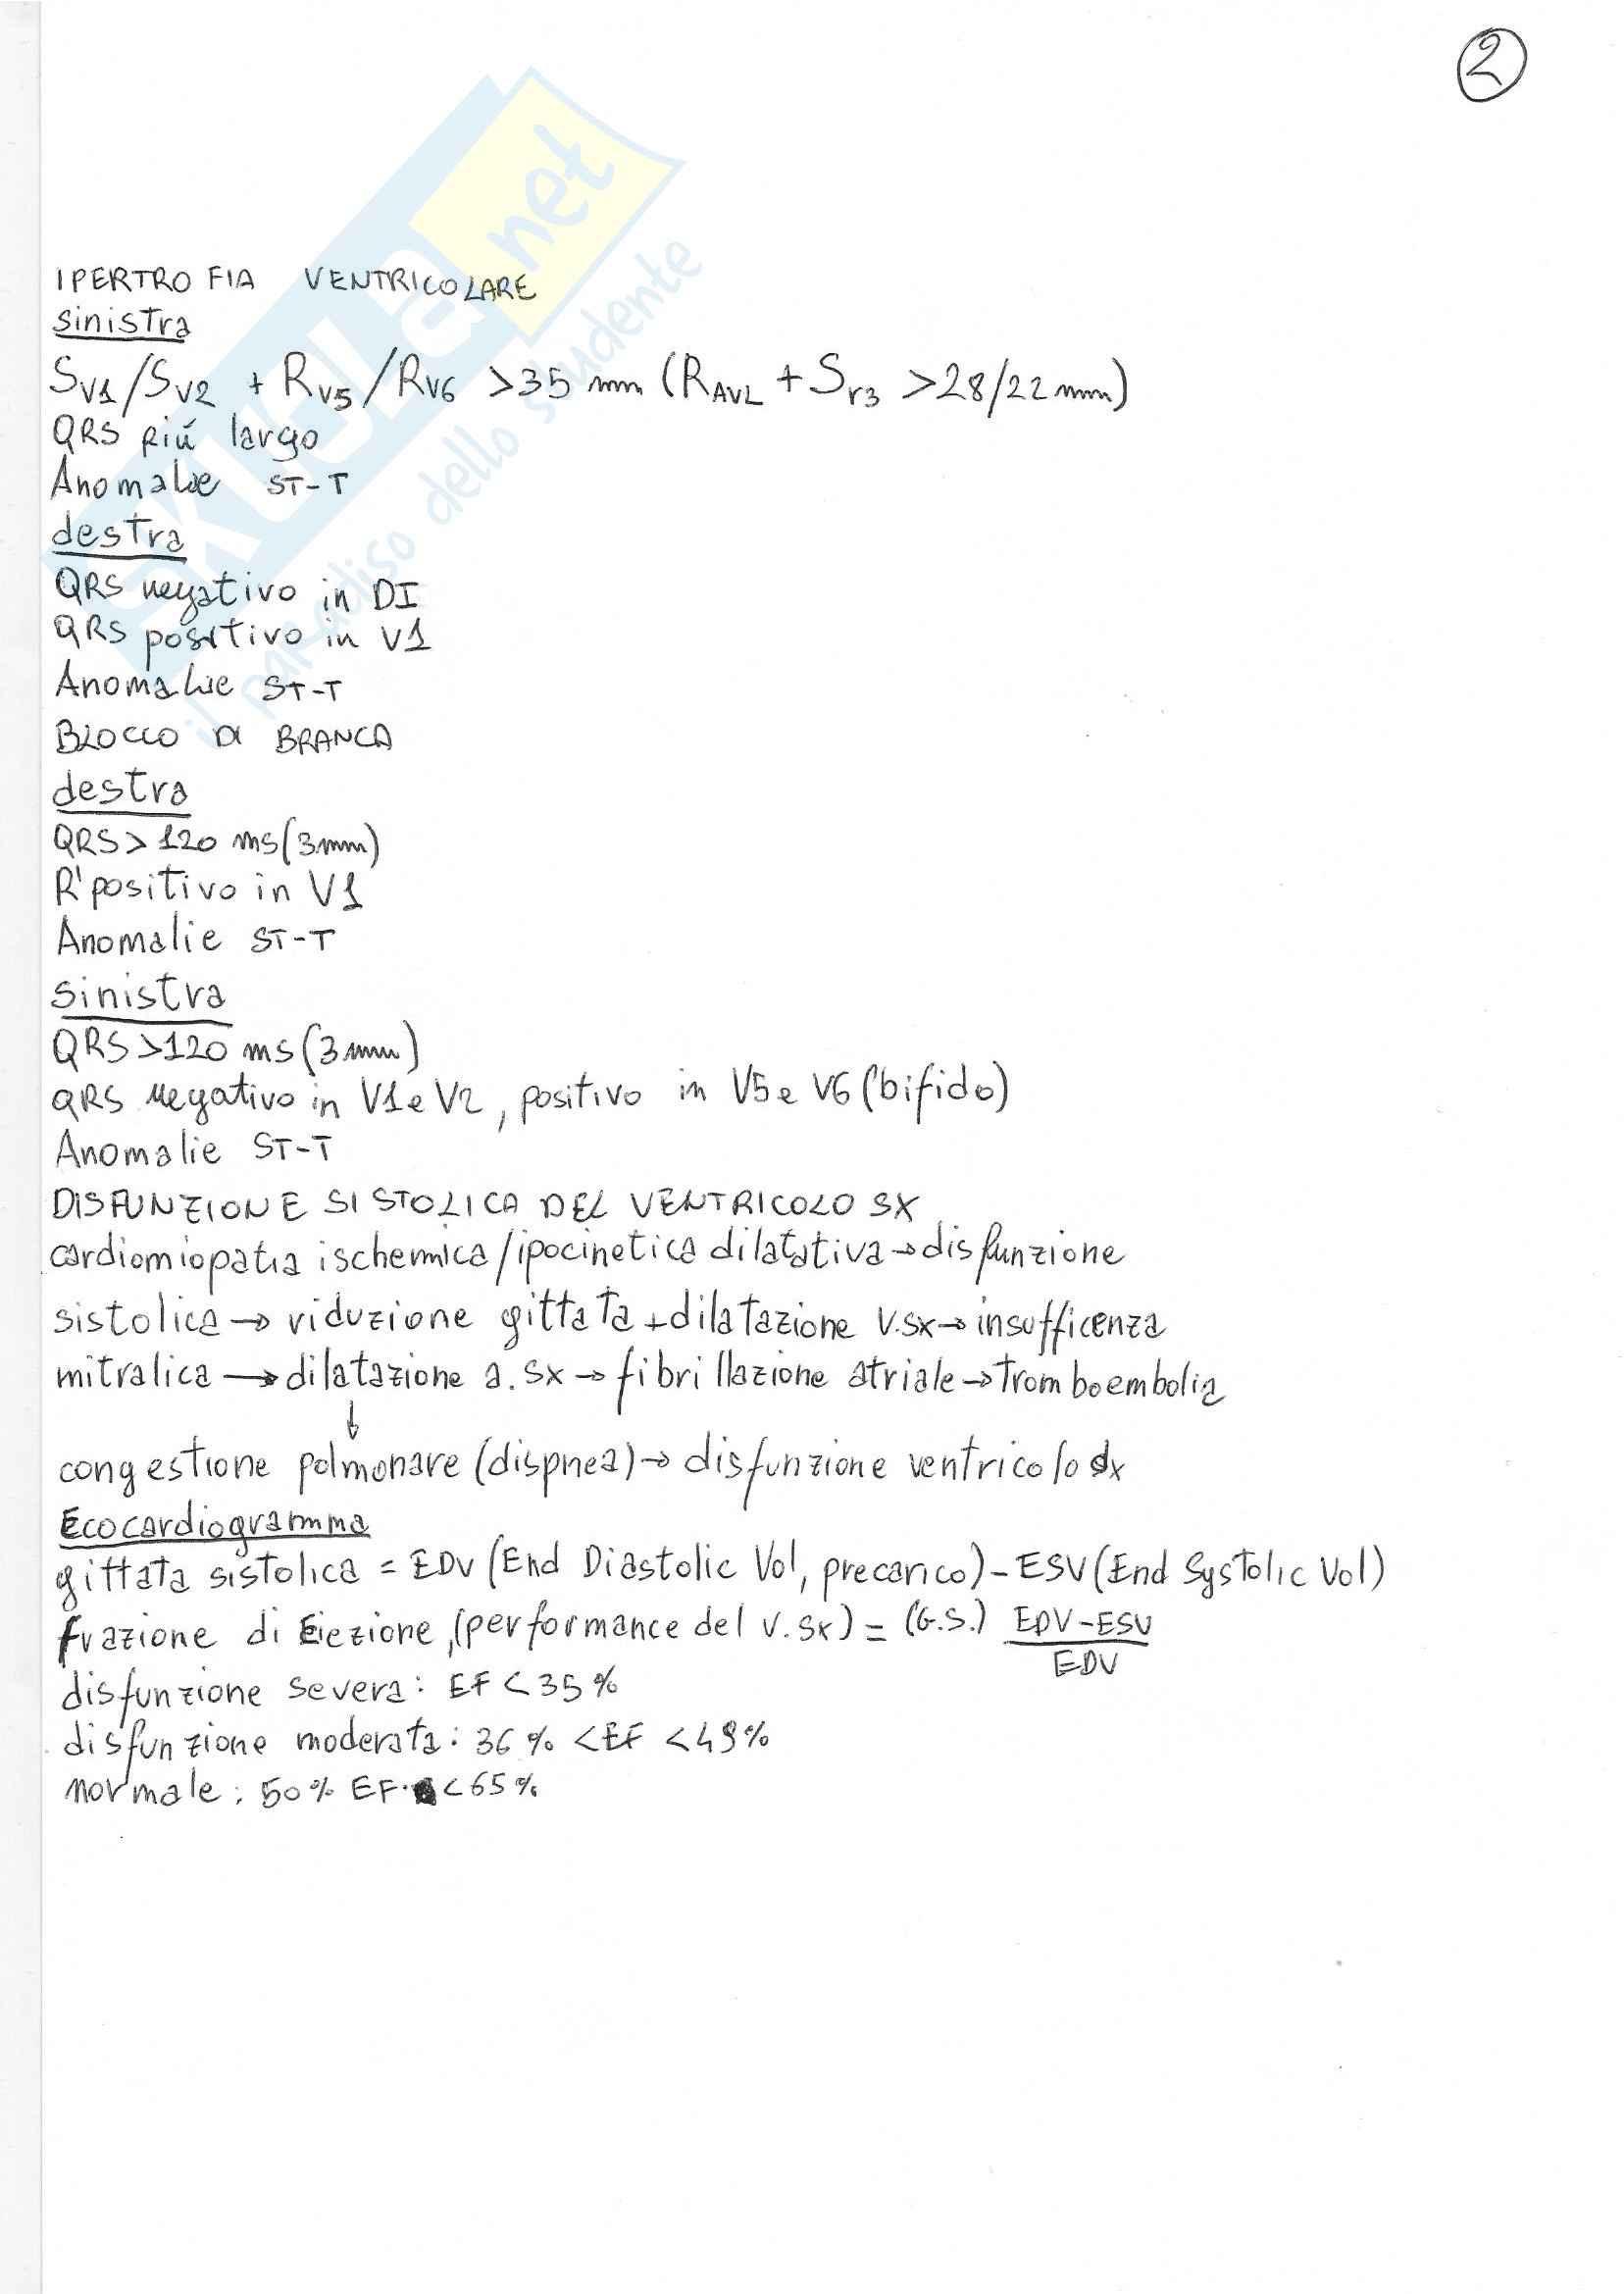 Cardiologia - Appunti parte 1 Pag. 2